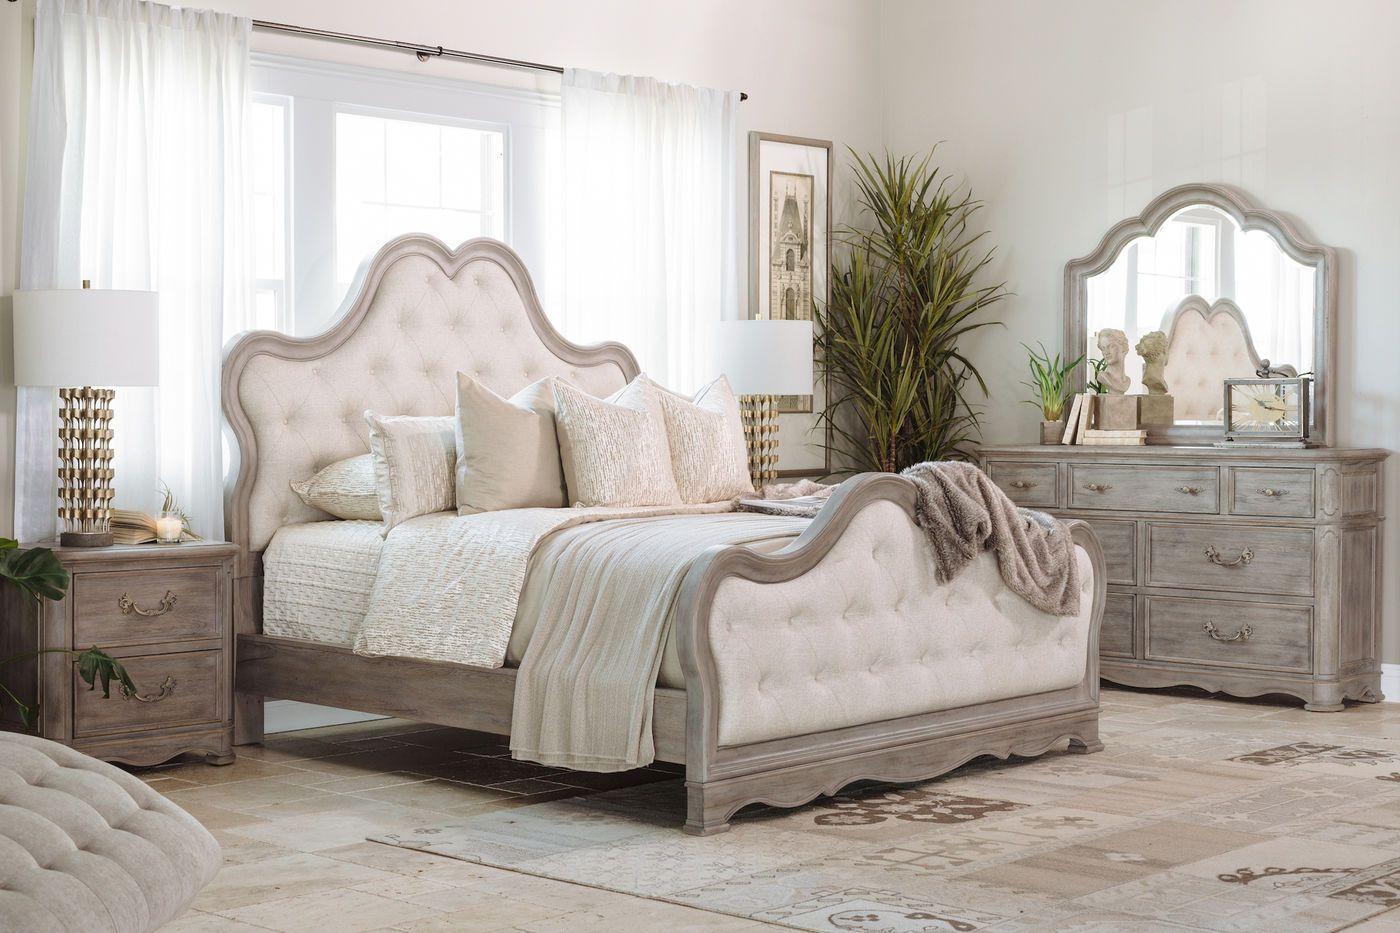 Pulaski Simply Charming Bedroom Suite Contemporary